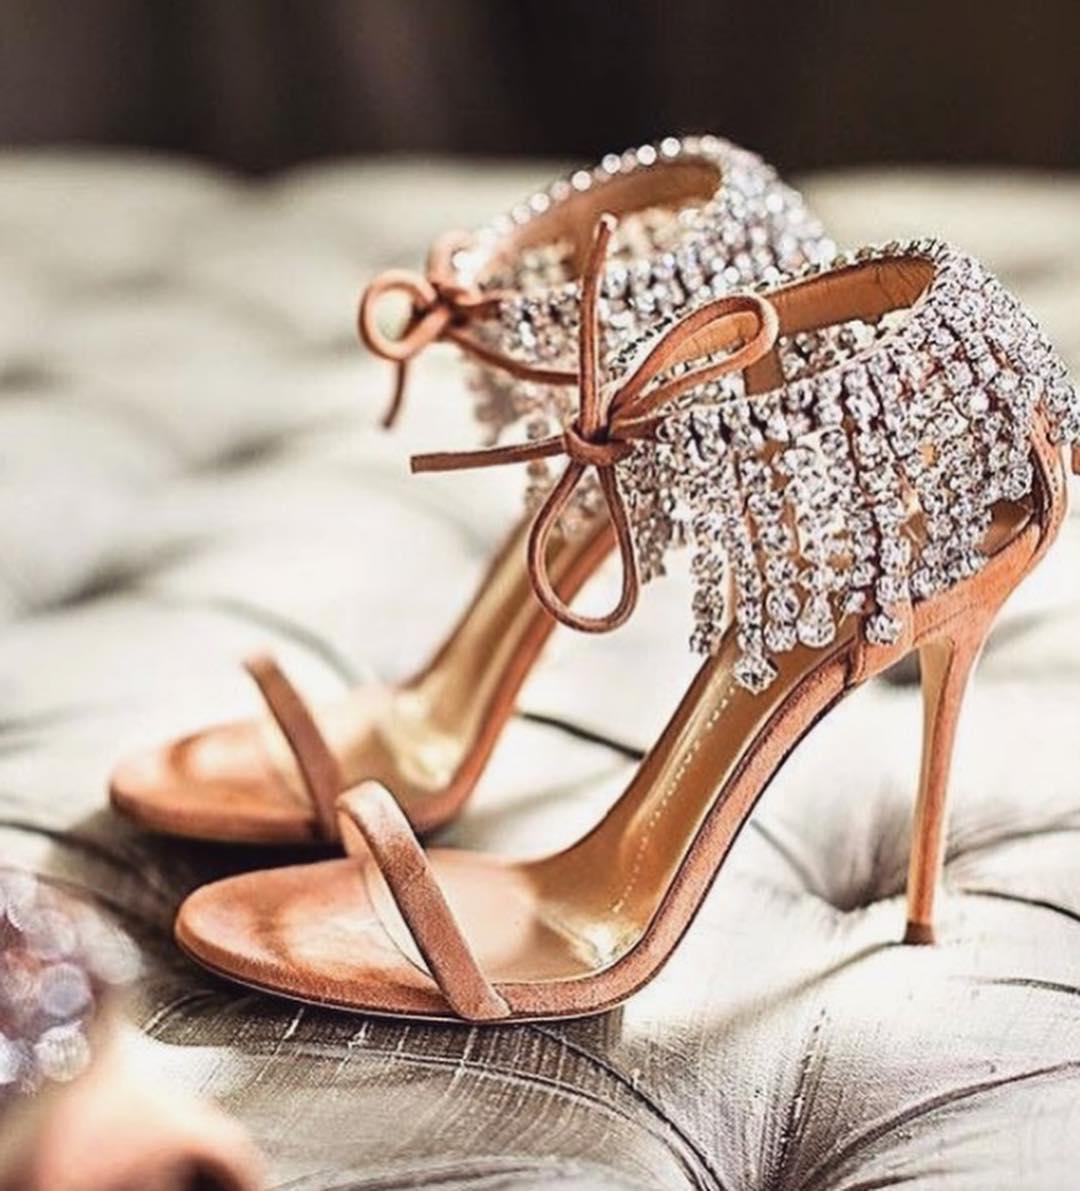 Suede Heel T-Strap Sandals with Hanging Rhinestones.